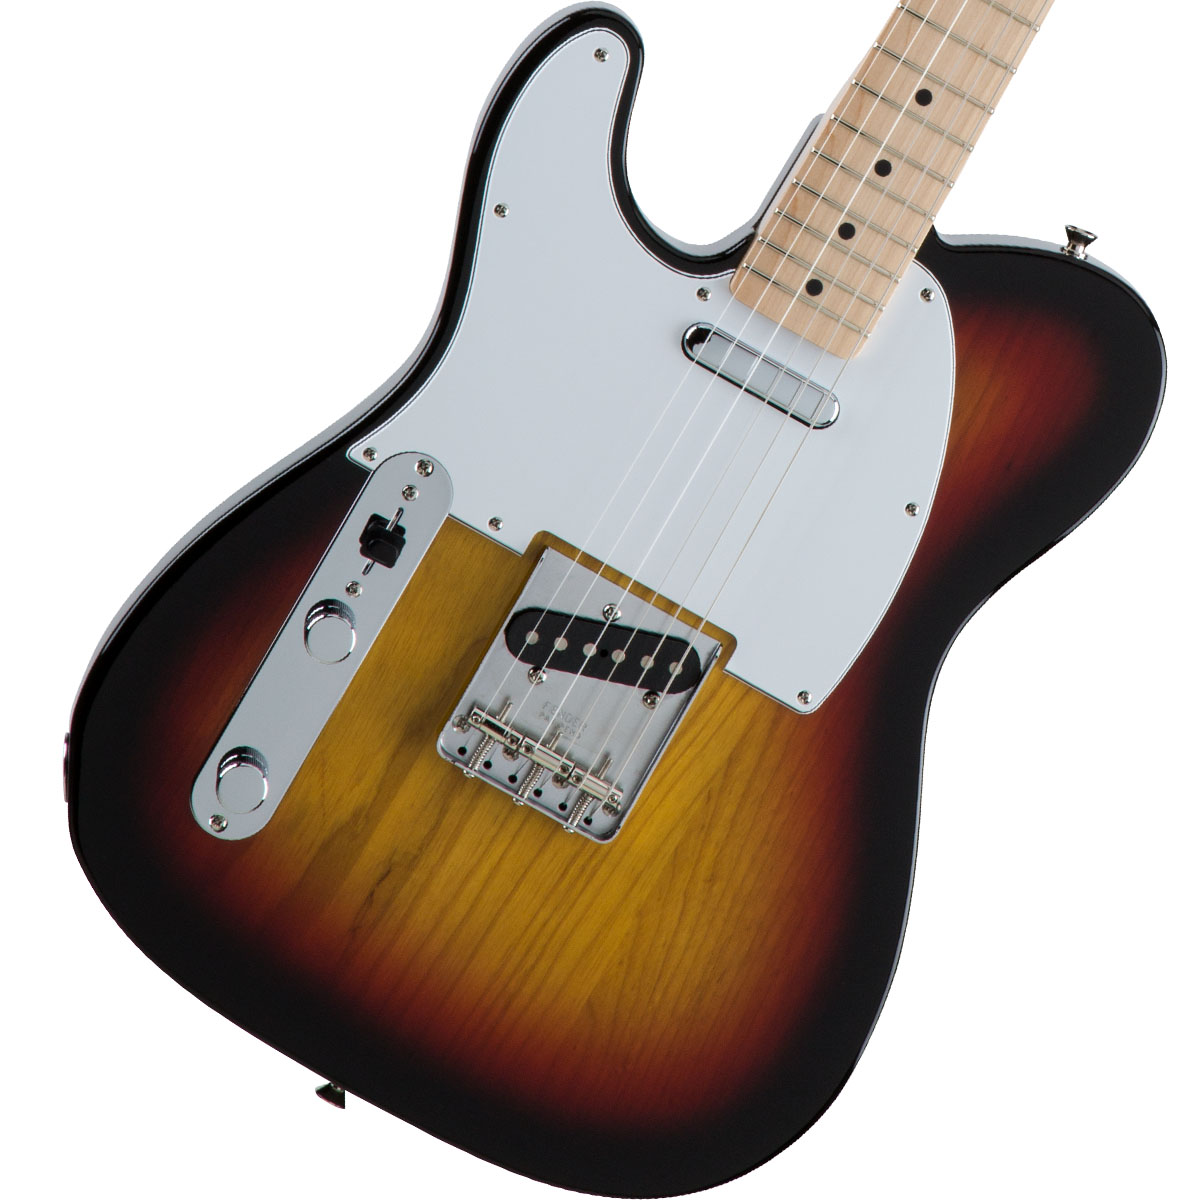 Fender / Made in Japan Traditional 70s Telecaster Ash Left-Hand 3-Color Sunburst 【お取り寄せ商品】《カスタムショップのお手入れ用品を進呈/+671038200》